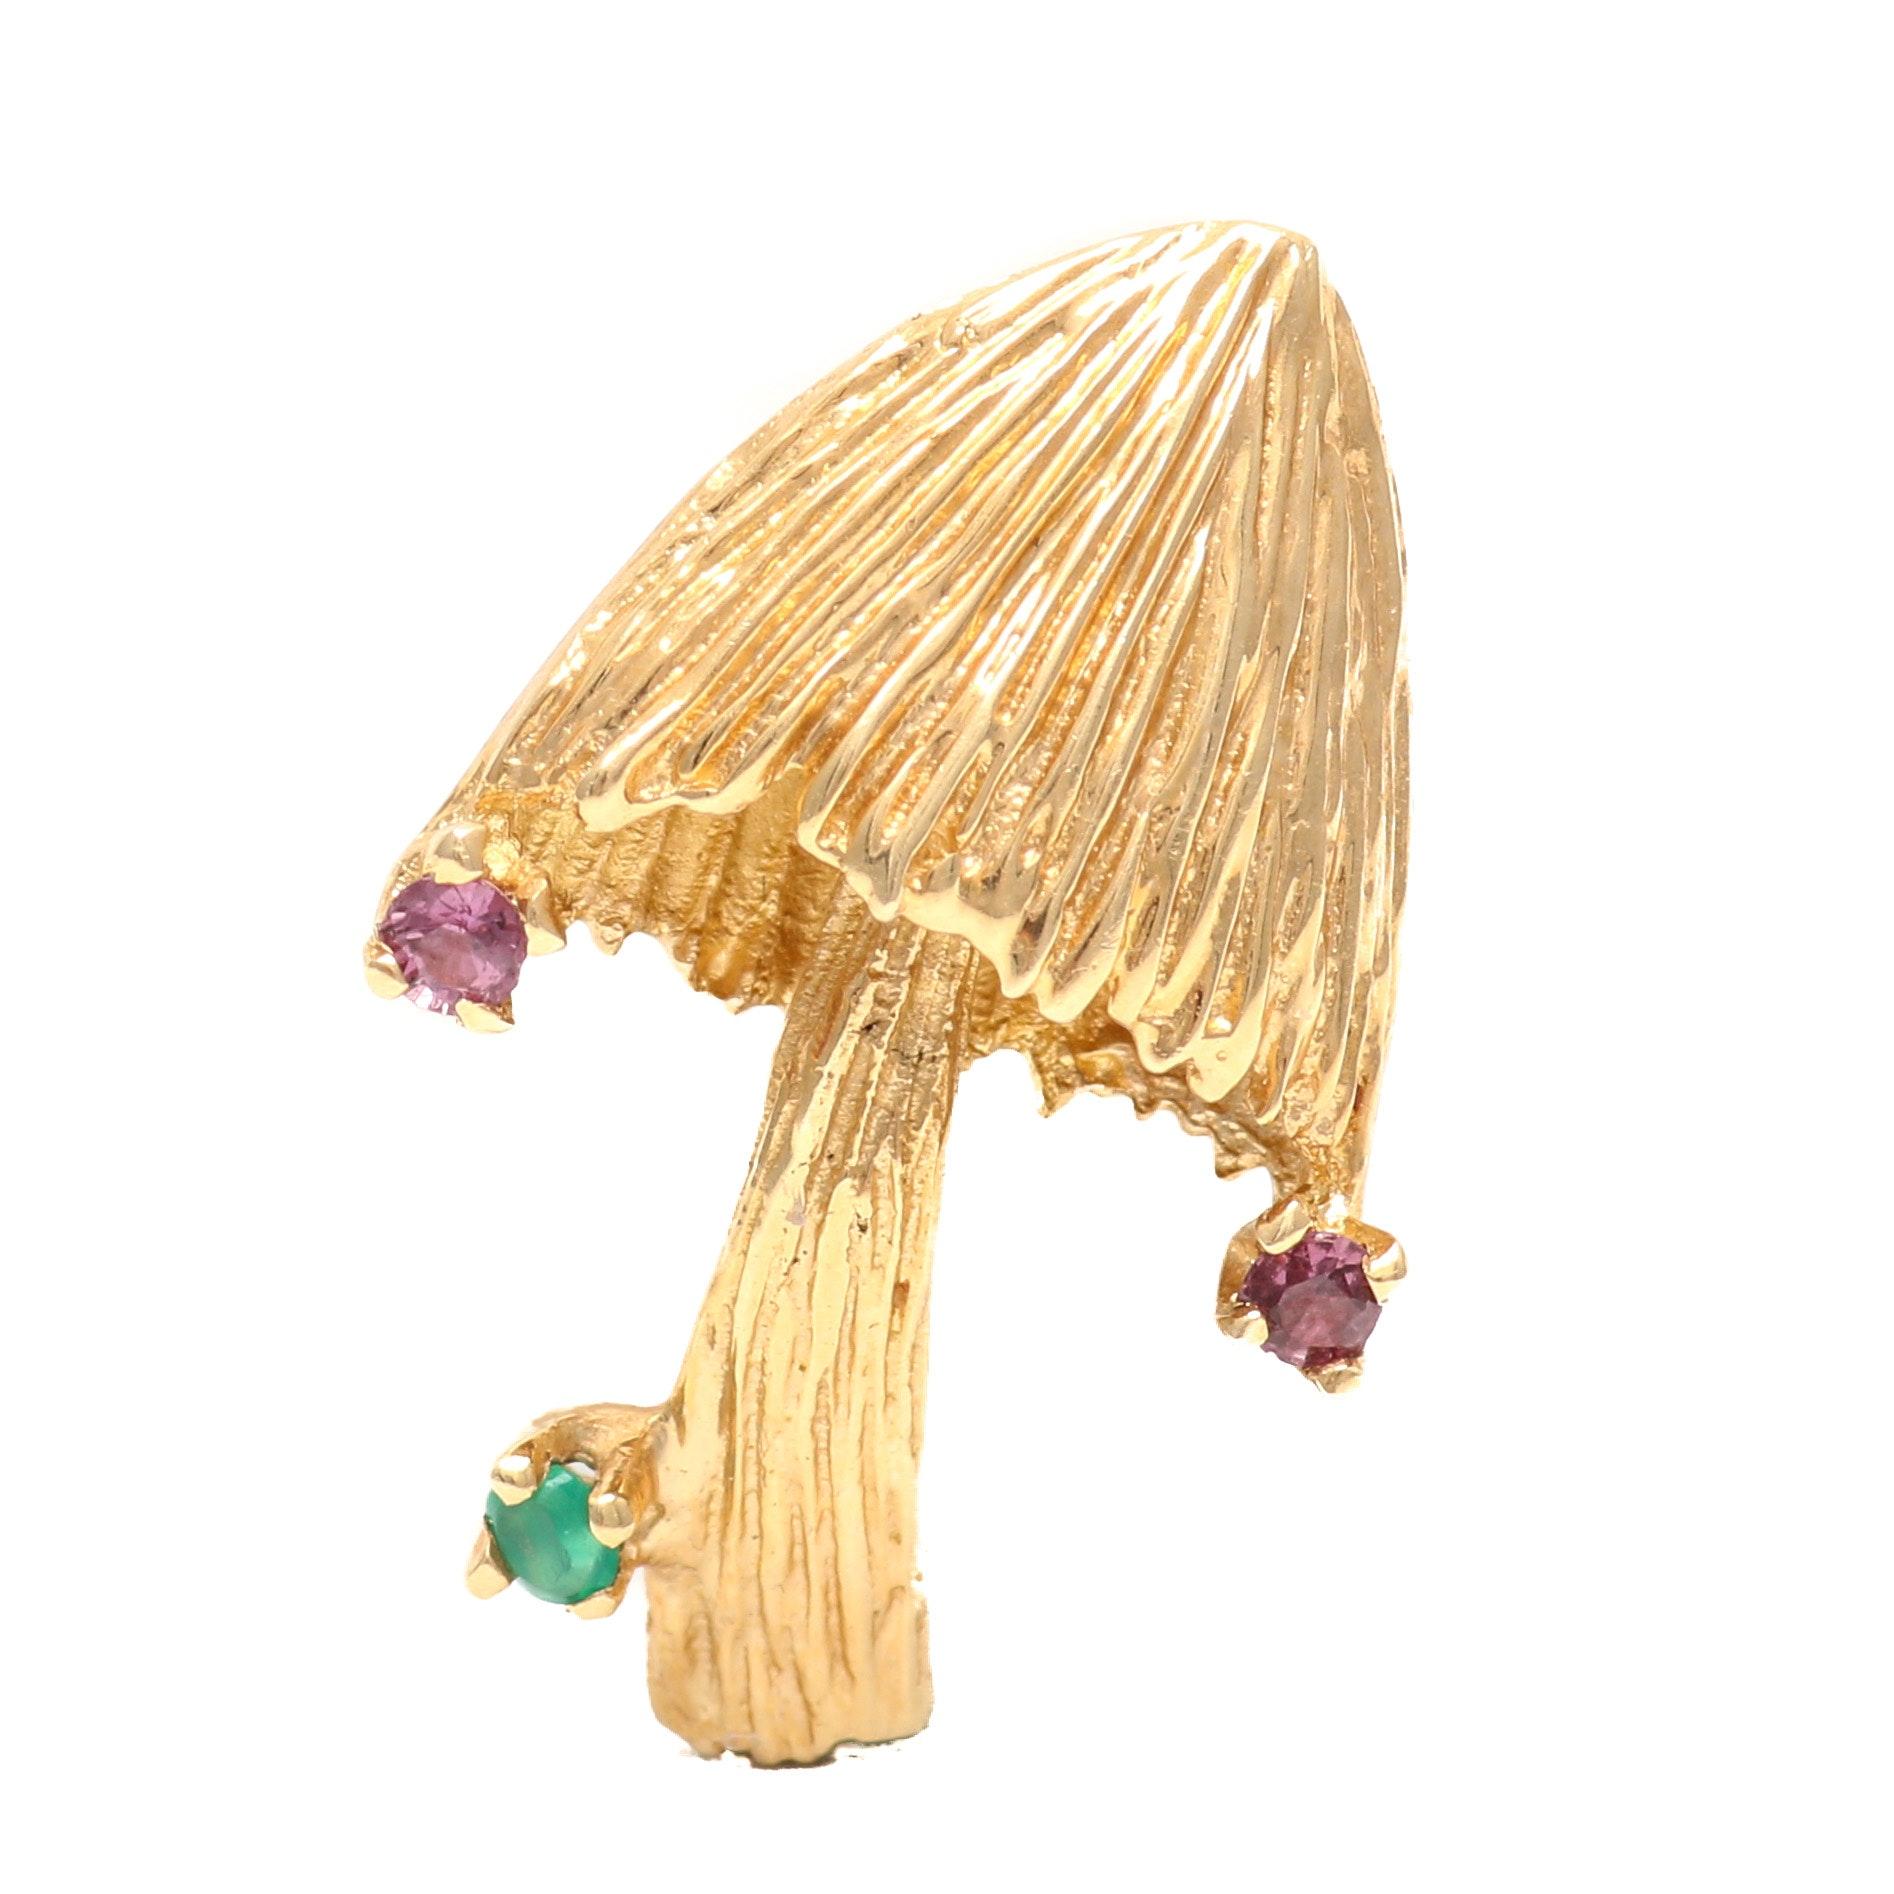 14K Yellow Gold Ruby and Emerald Mushroom Brooch